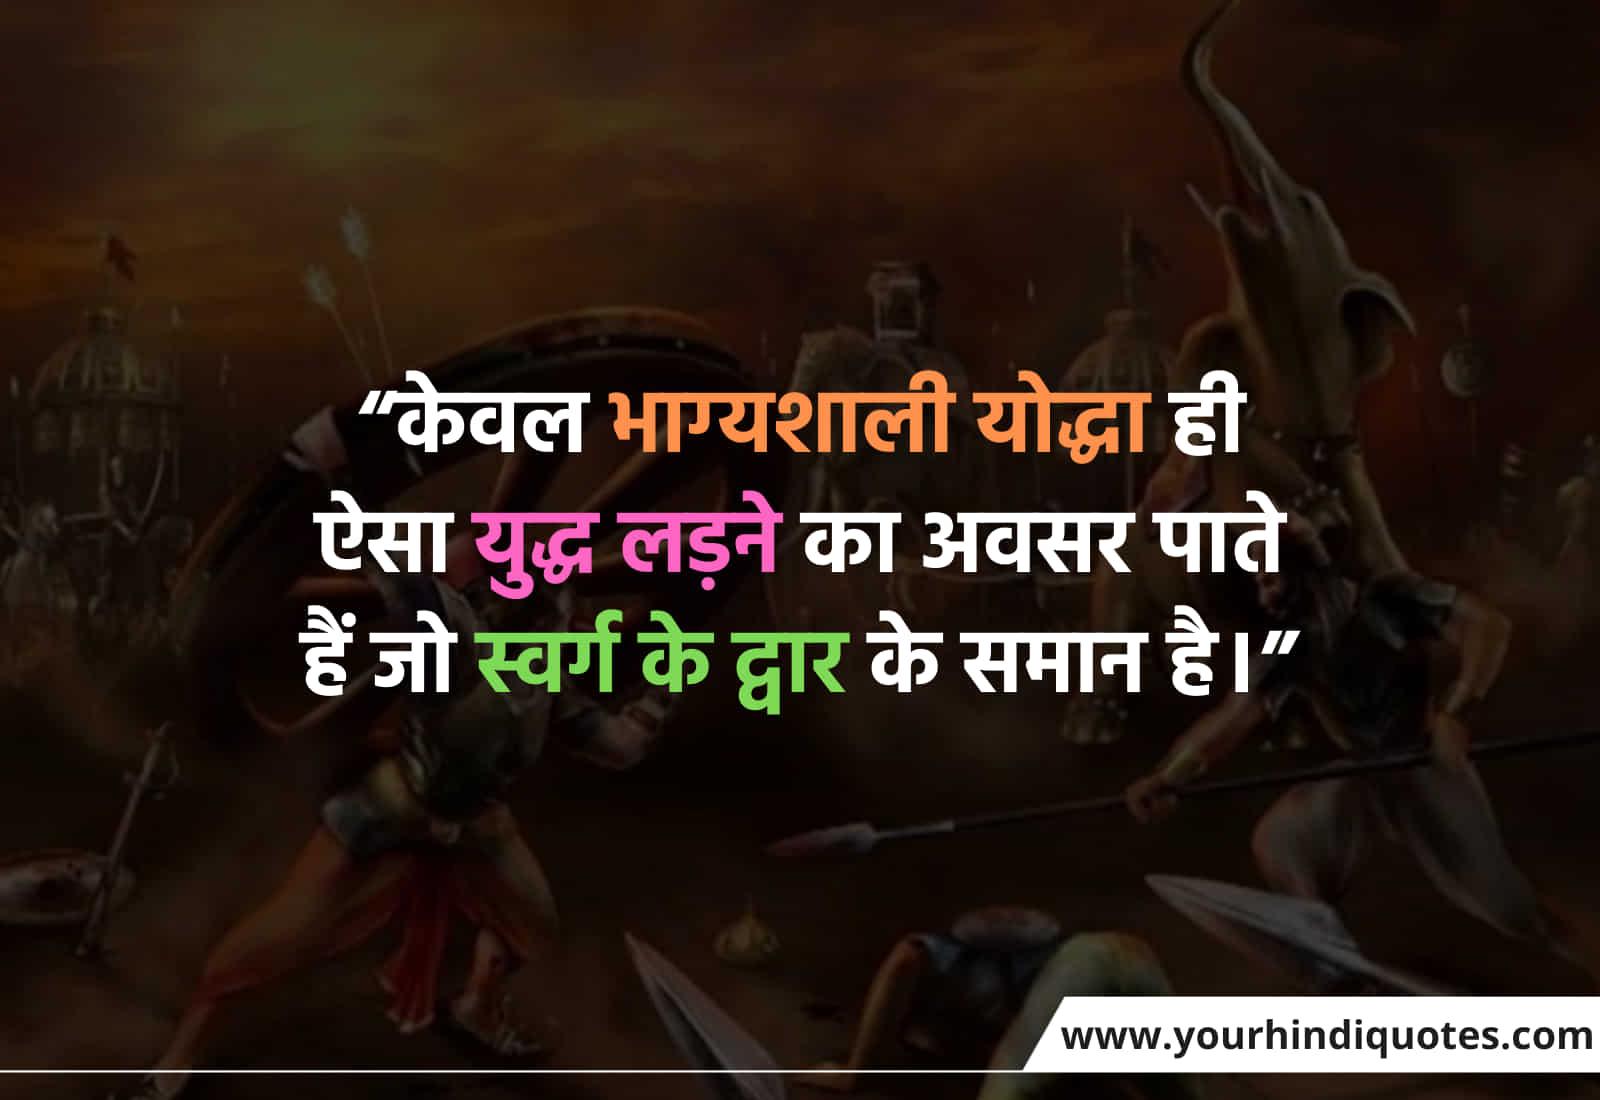 Shrimad Bhagwat Gita Quotes for Goal